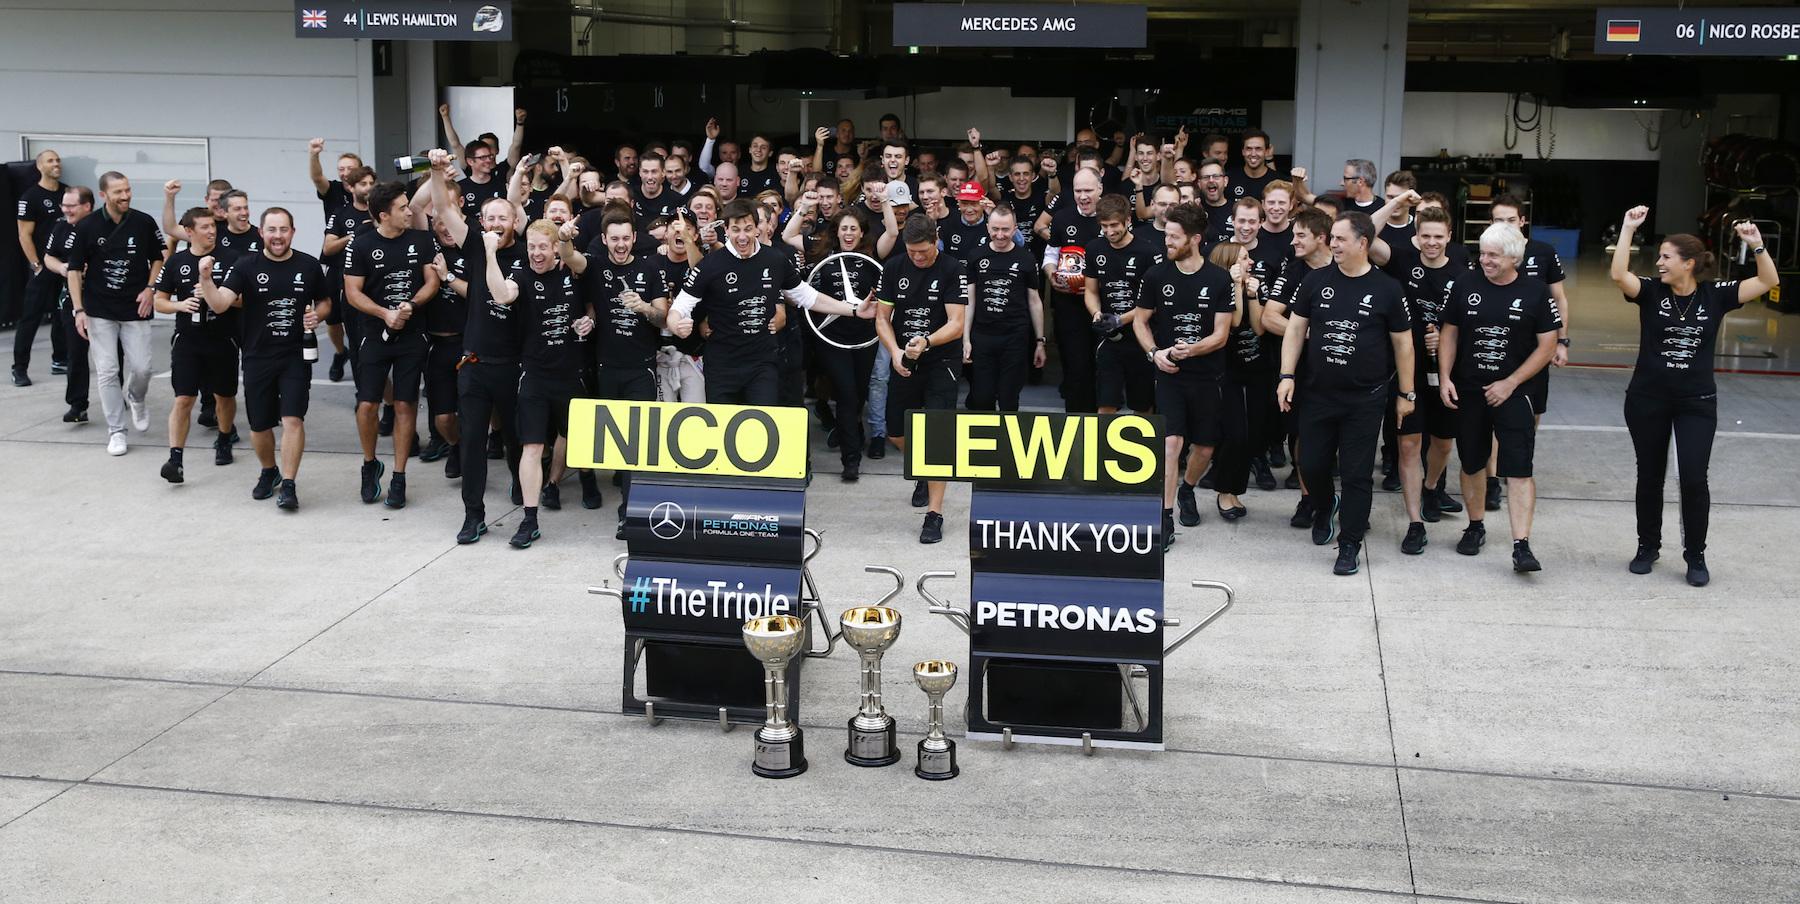 Salracing - Mercedes Team celebrating at Suzuka